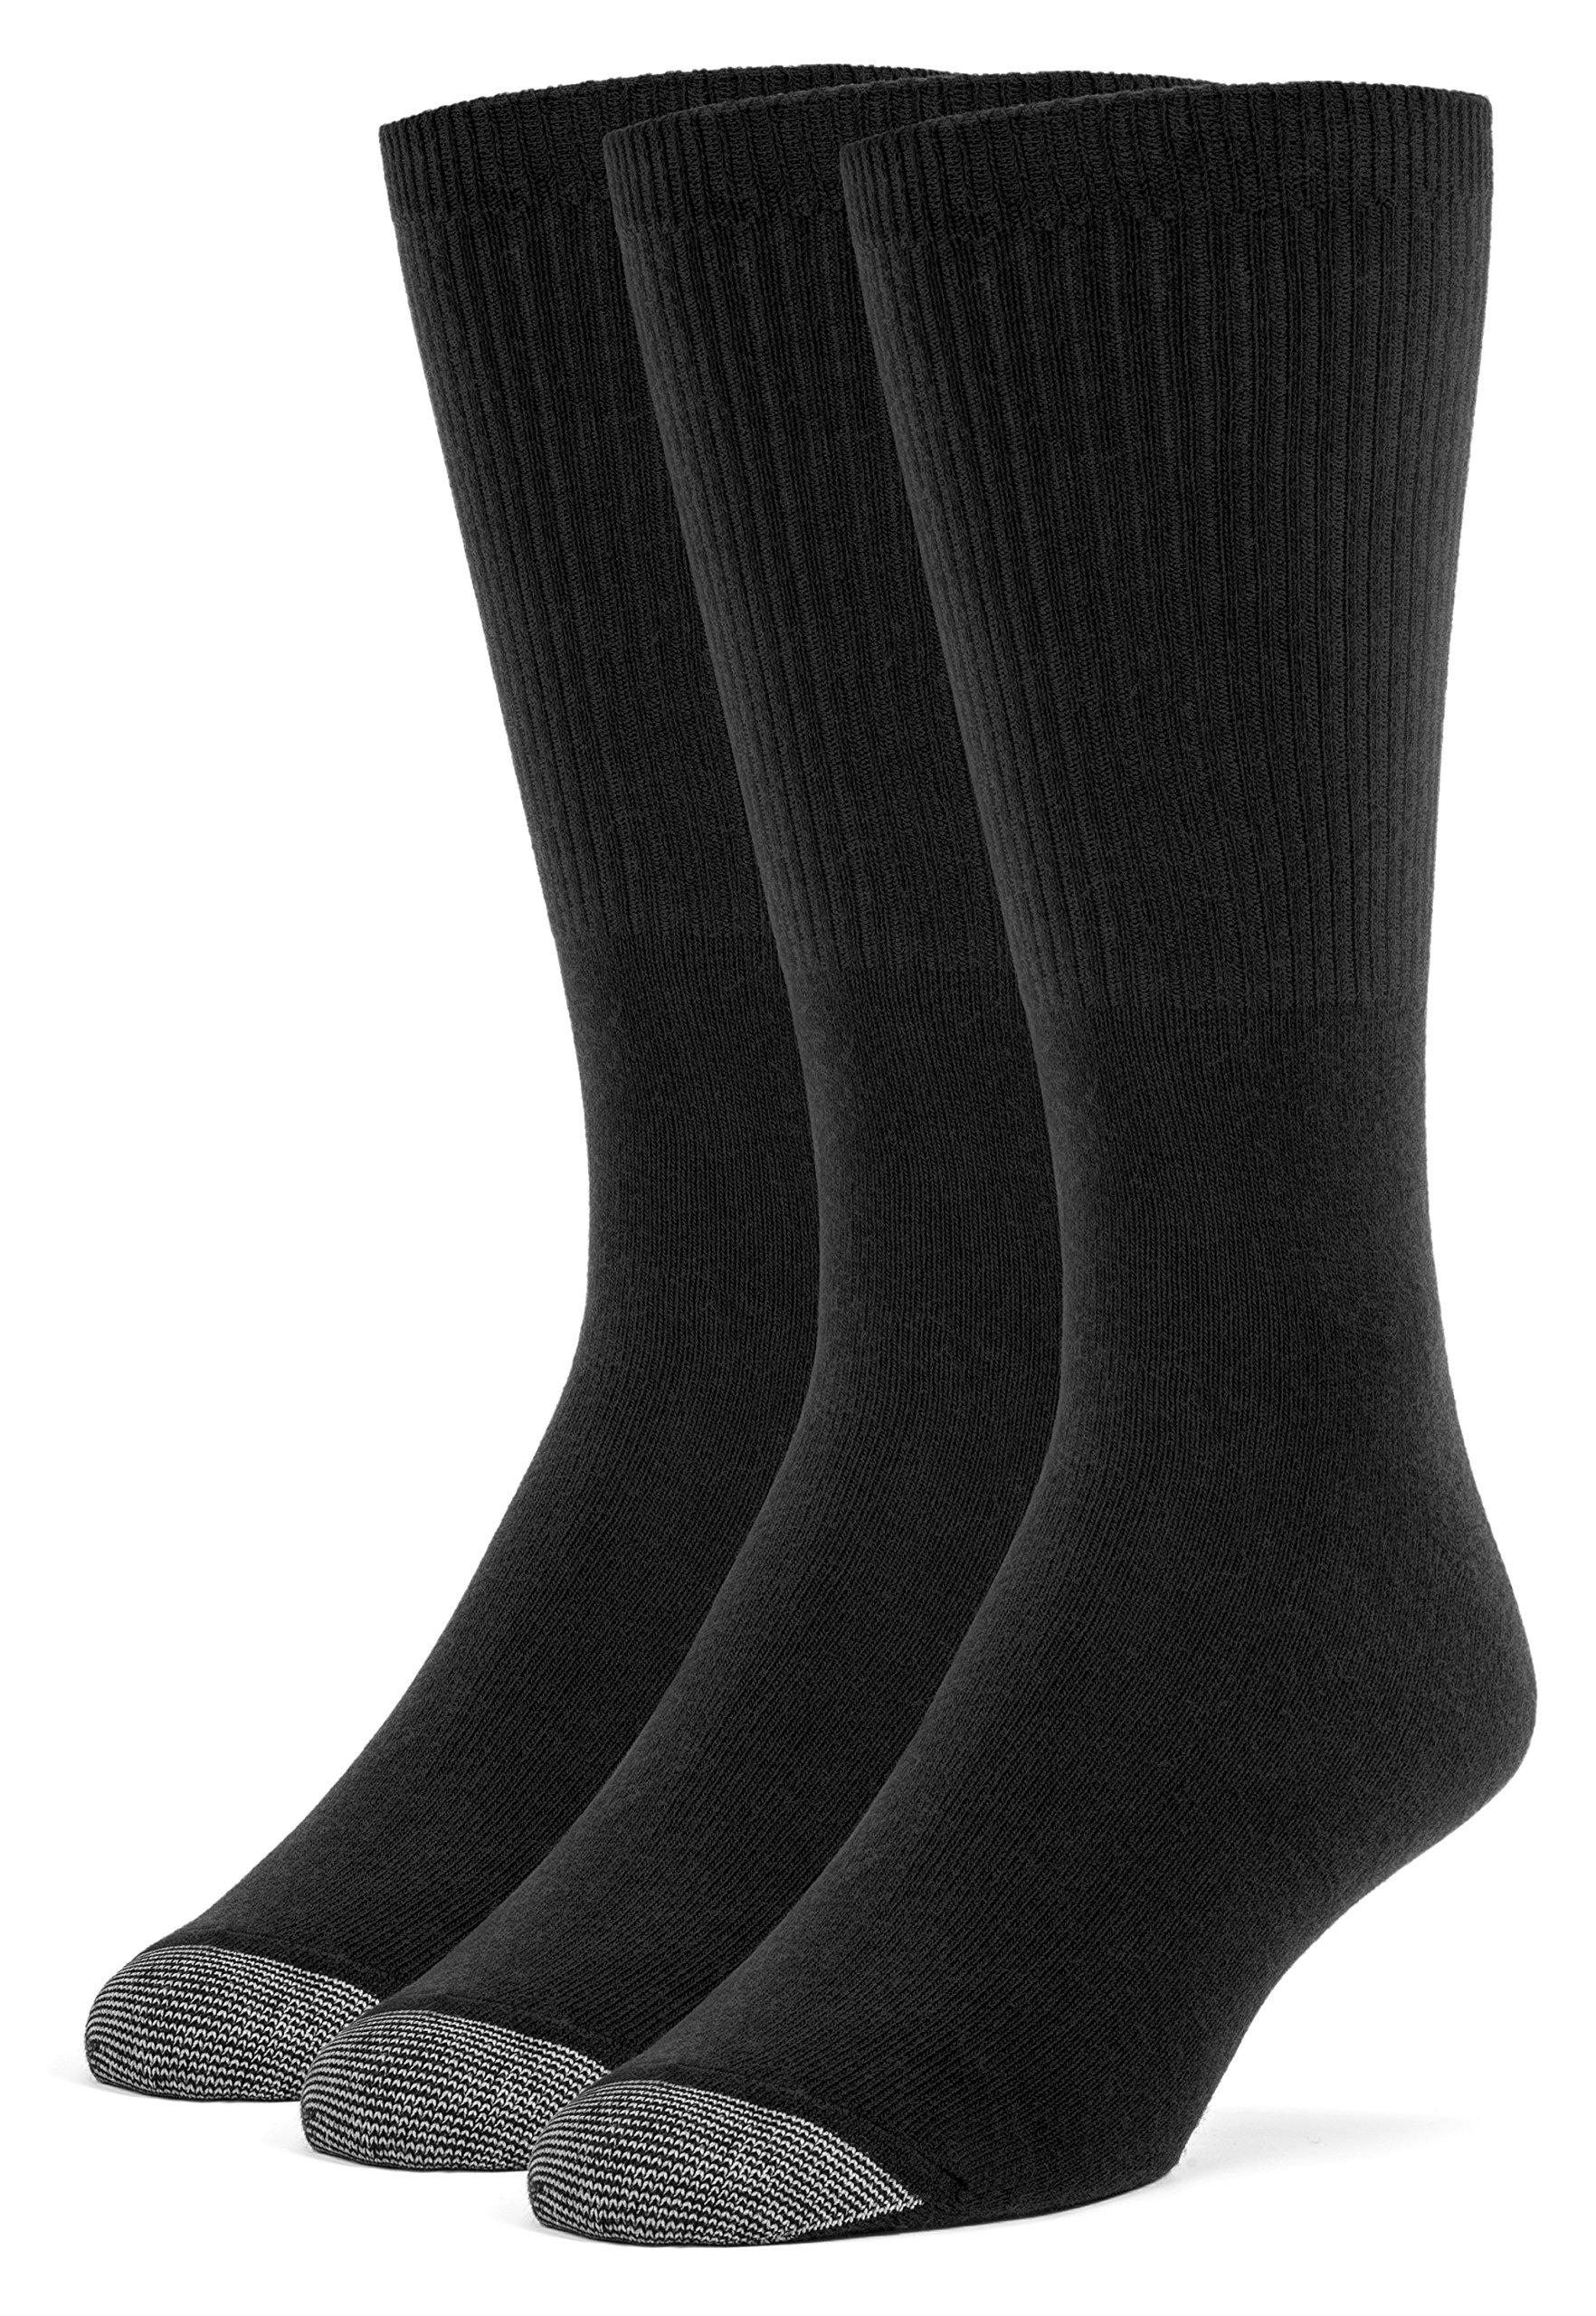 Galiva Men's Cotton Lightweight Fashion Dress Socks - 3 Pairs, Medium, Black